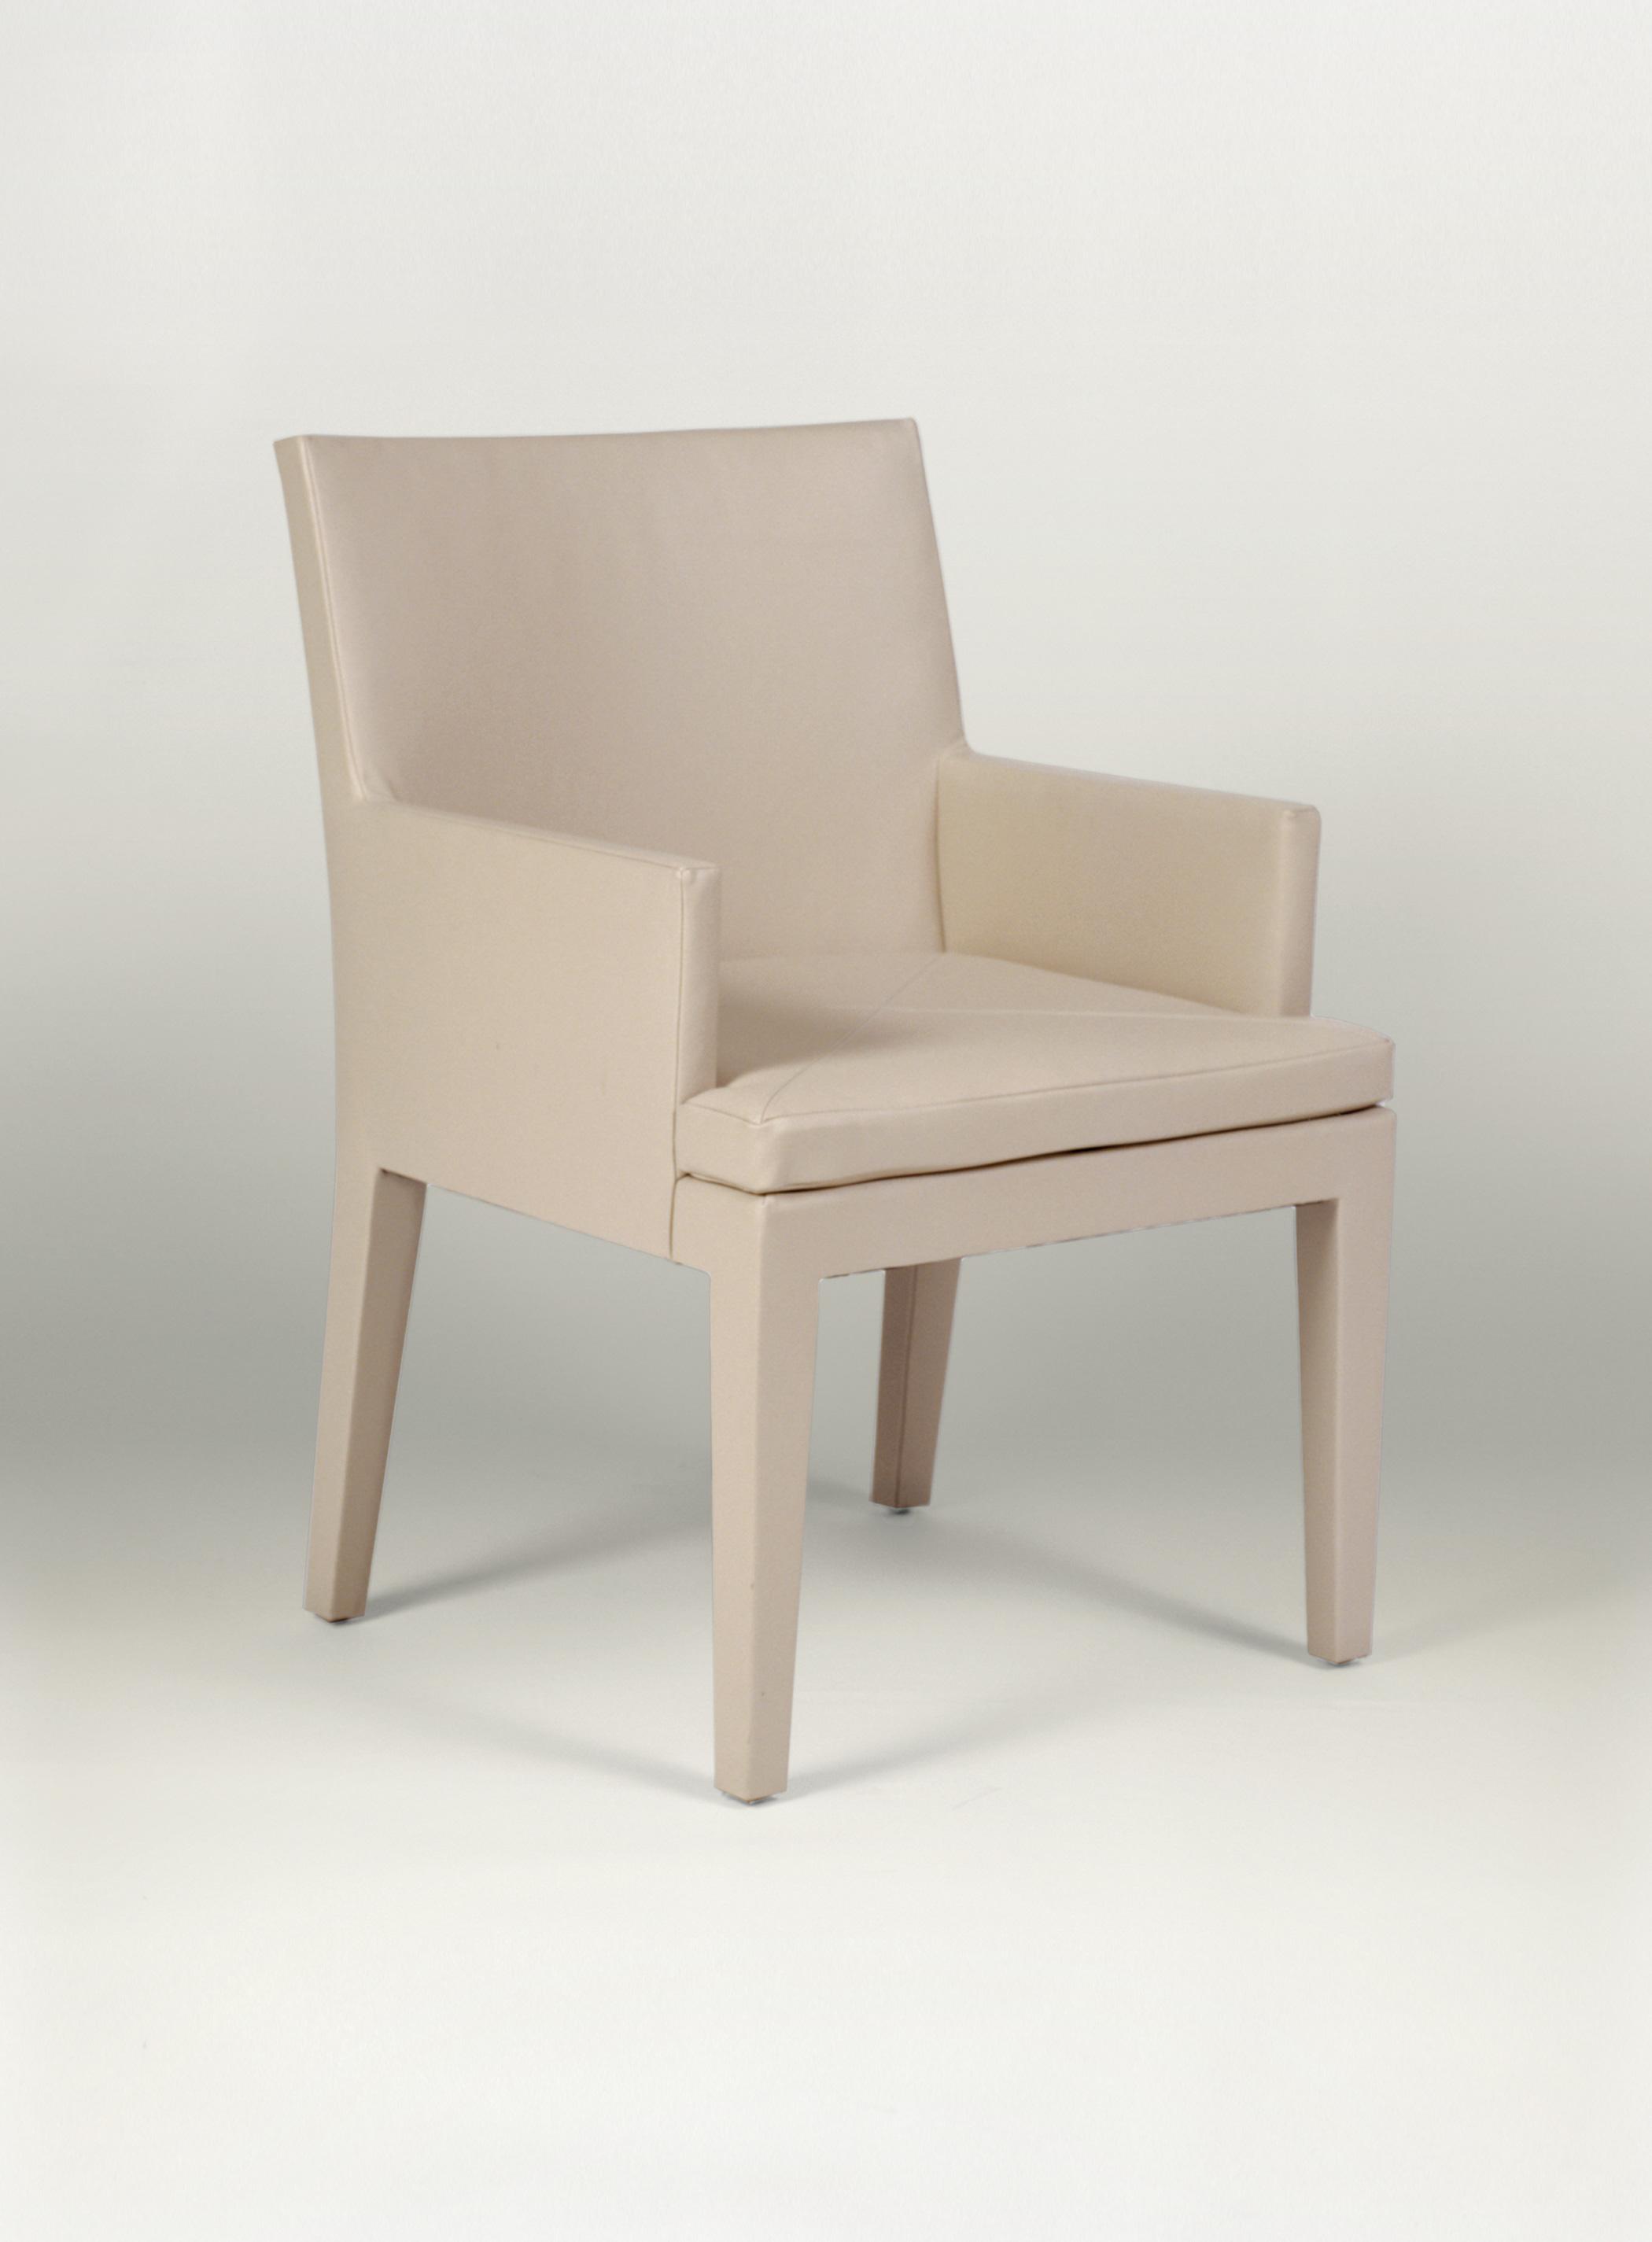 Della Spiga Arm Chair by Magni Home Collection